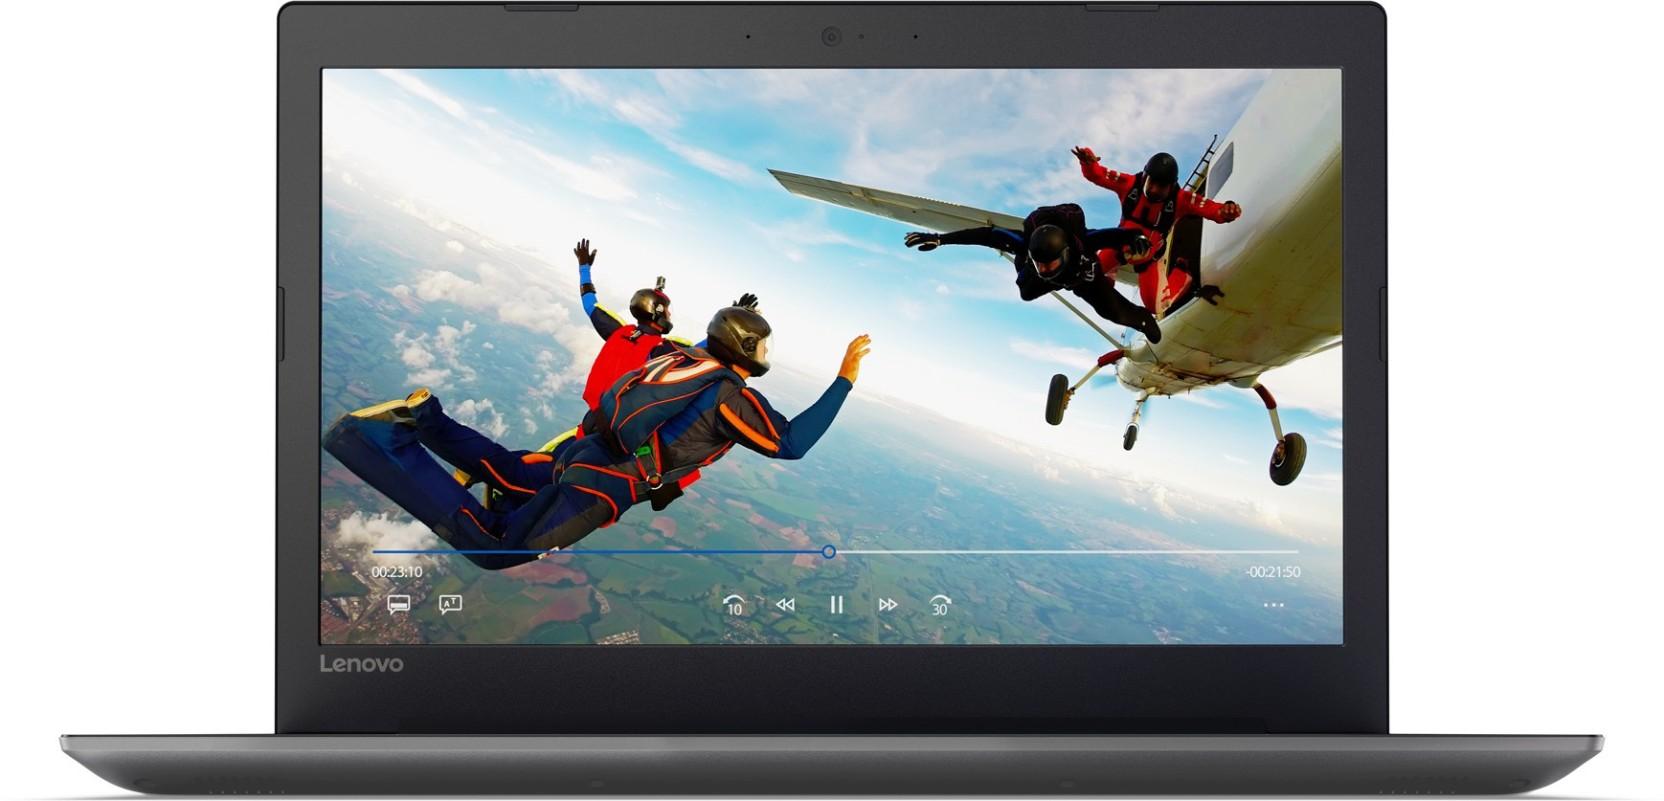 Promo Harga Fortnite On Lenovo Ideapad 320 Core I5 7200u 940mx P Pavilion 14 Al168tx Notebook Silver 4gb 1tb 14ampquot Win 10 Mcafee I3 6th Gen 4 Gb 1 Tb Hdd Dos Ip 320e Laptop